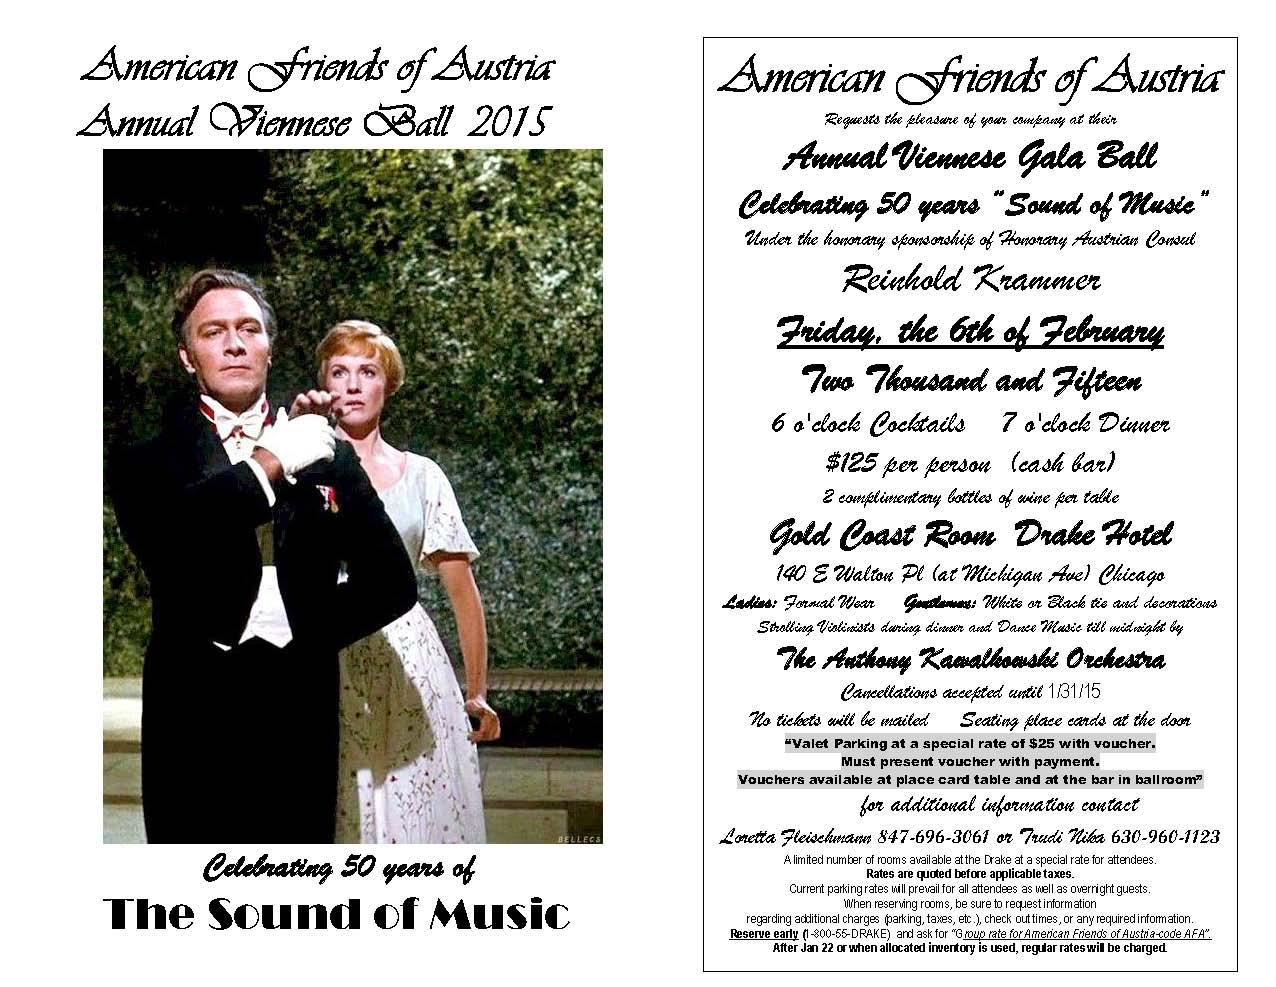 2015 AFA Viennese Ball - Invitation